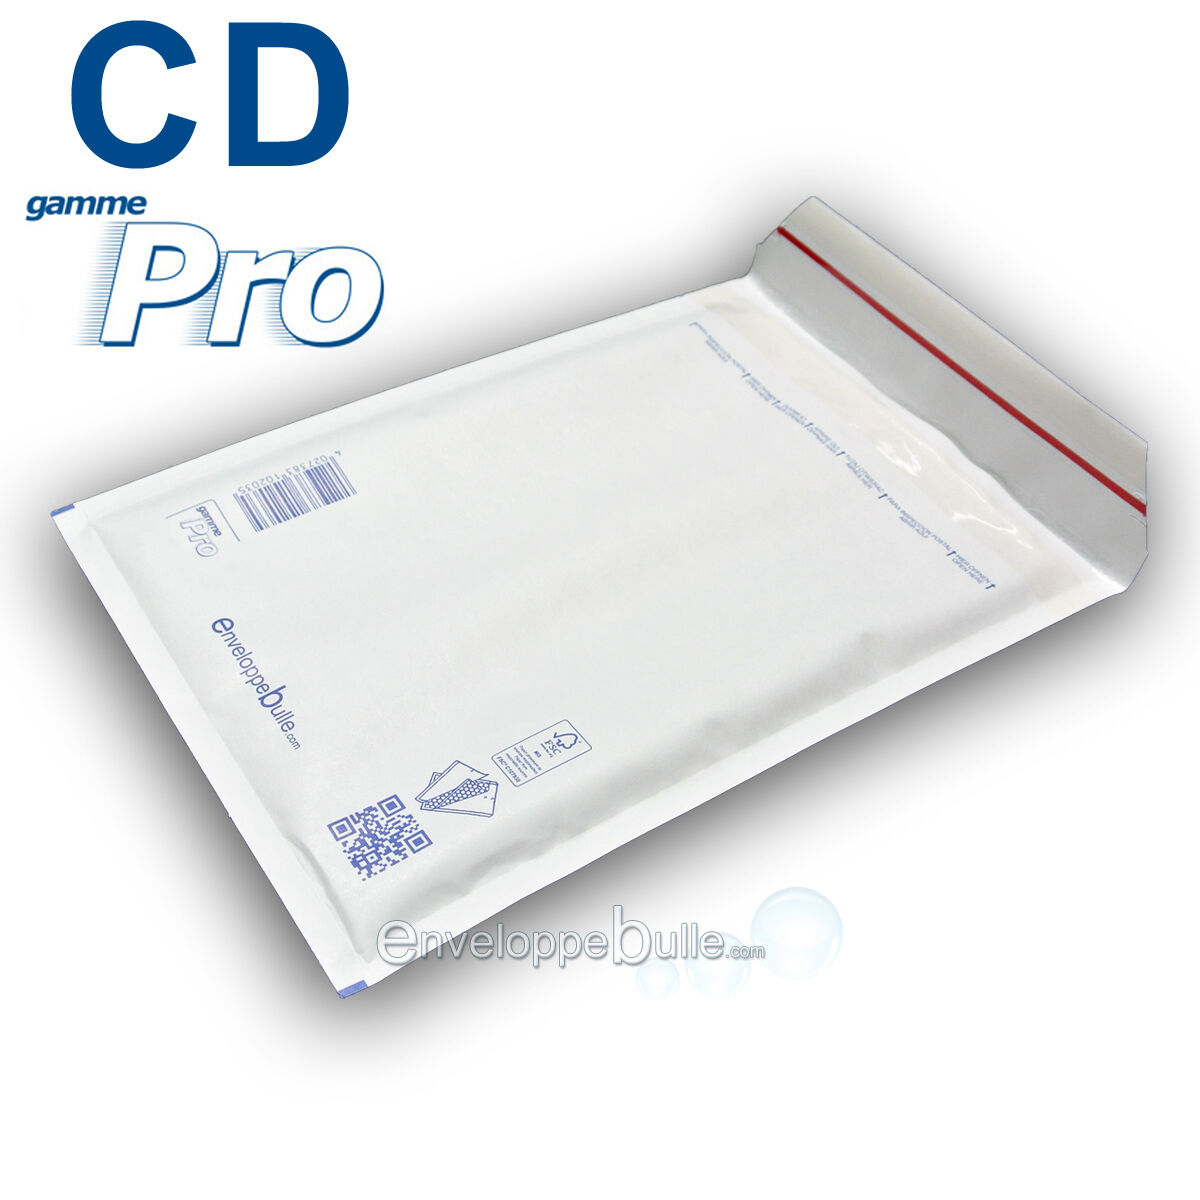 Enveloppes à bulles mm PRO CD format 145x175 mm bulles b217f0